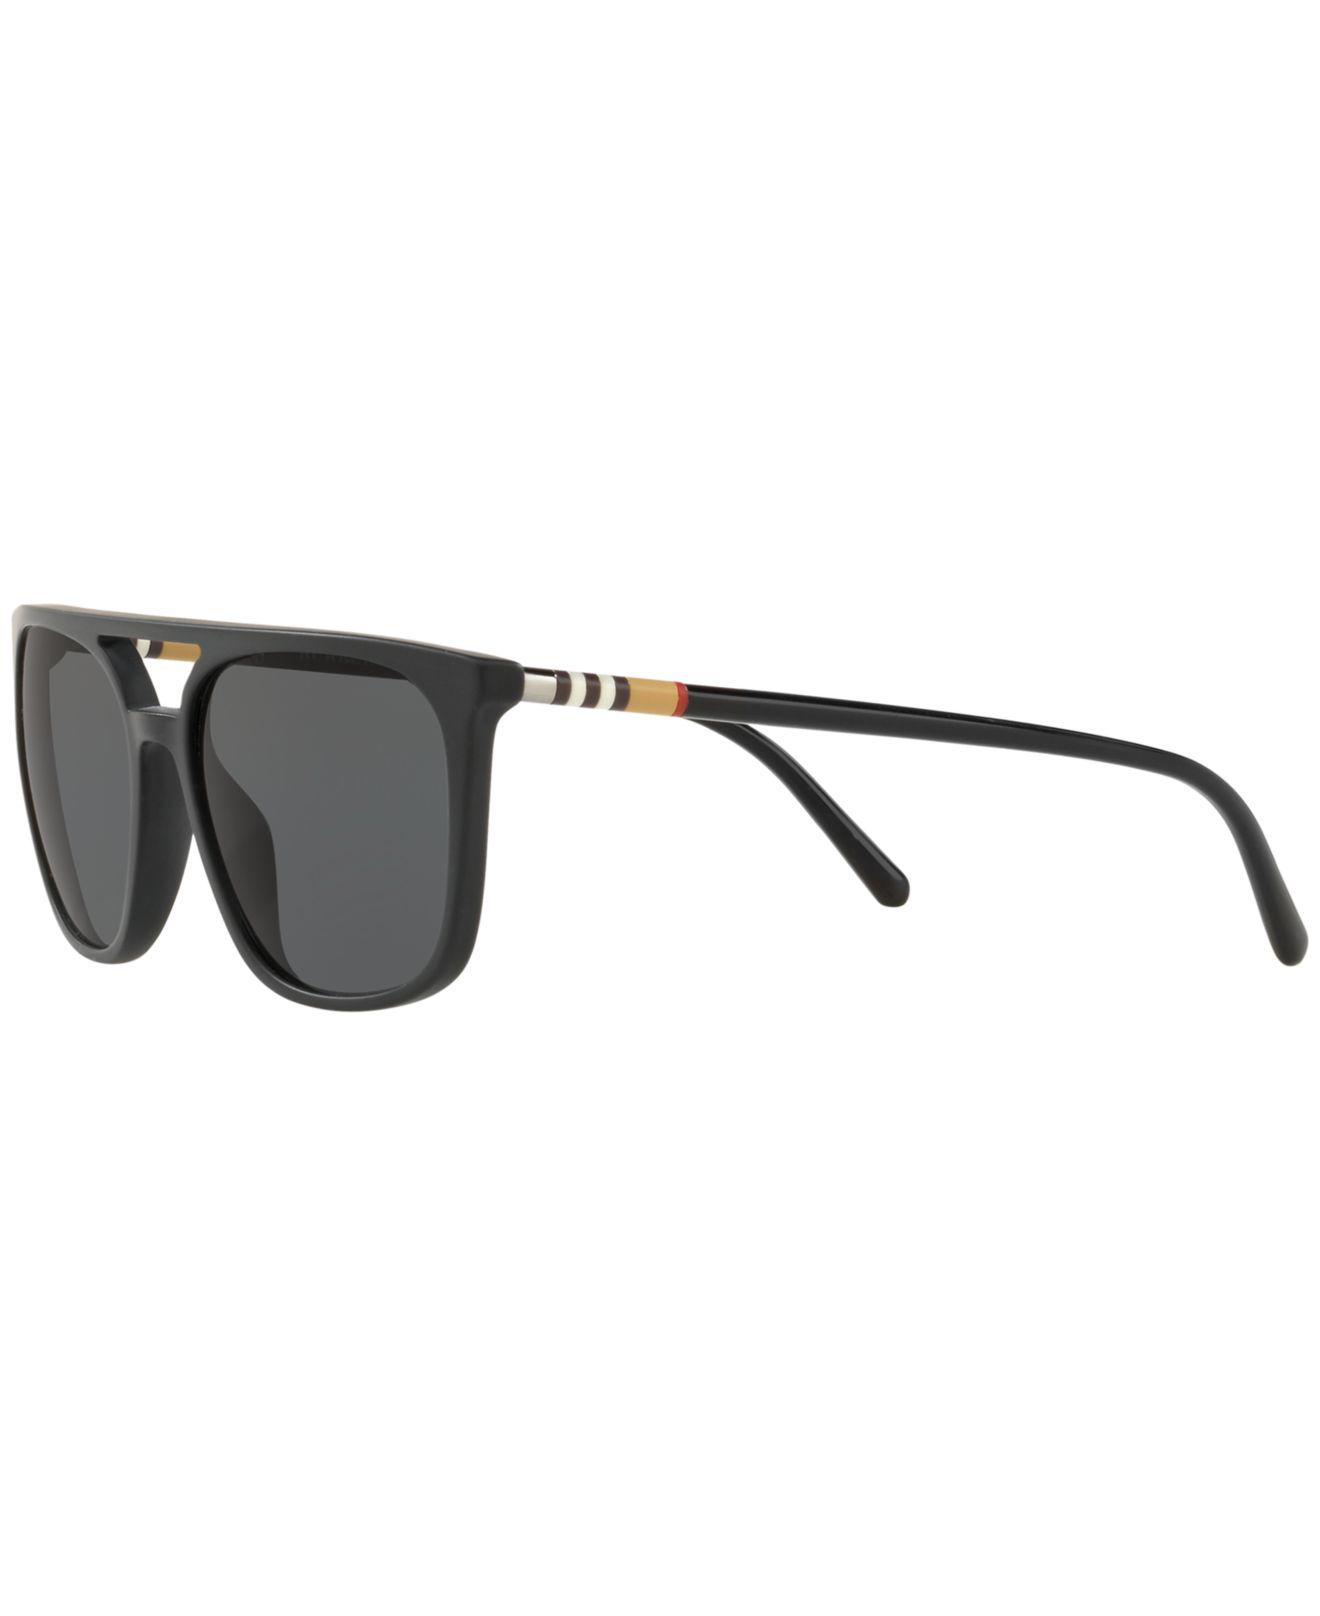 ae9913f2c55 Burberry - Black Be4257 for Men - Lyst. View fullscreen